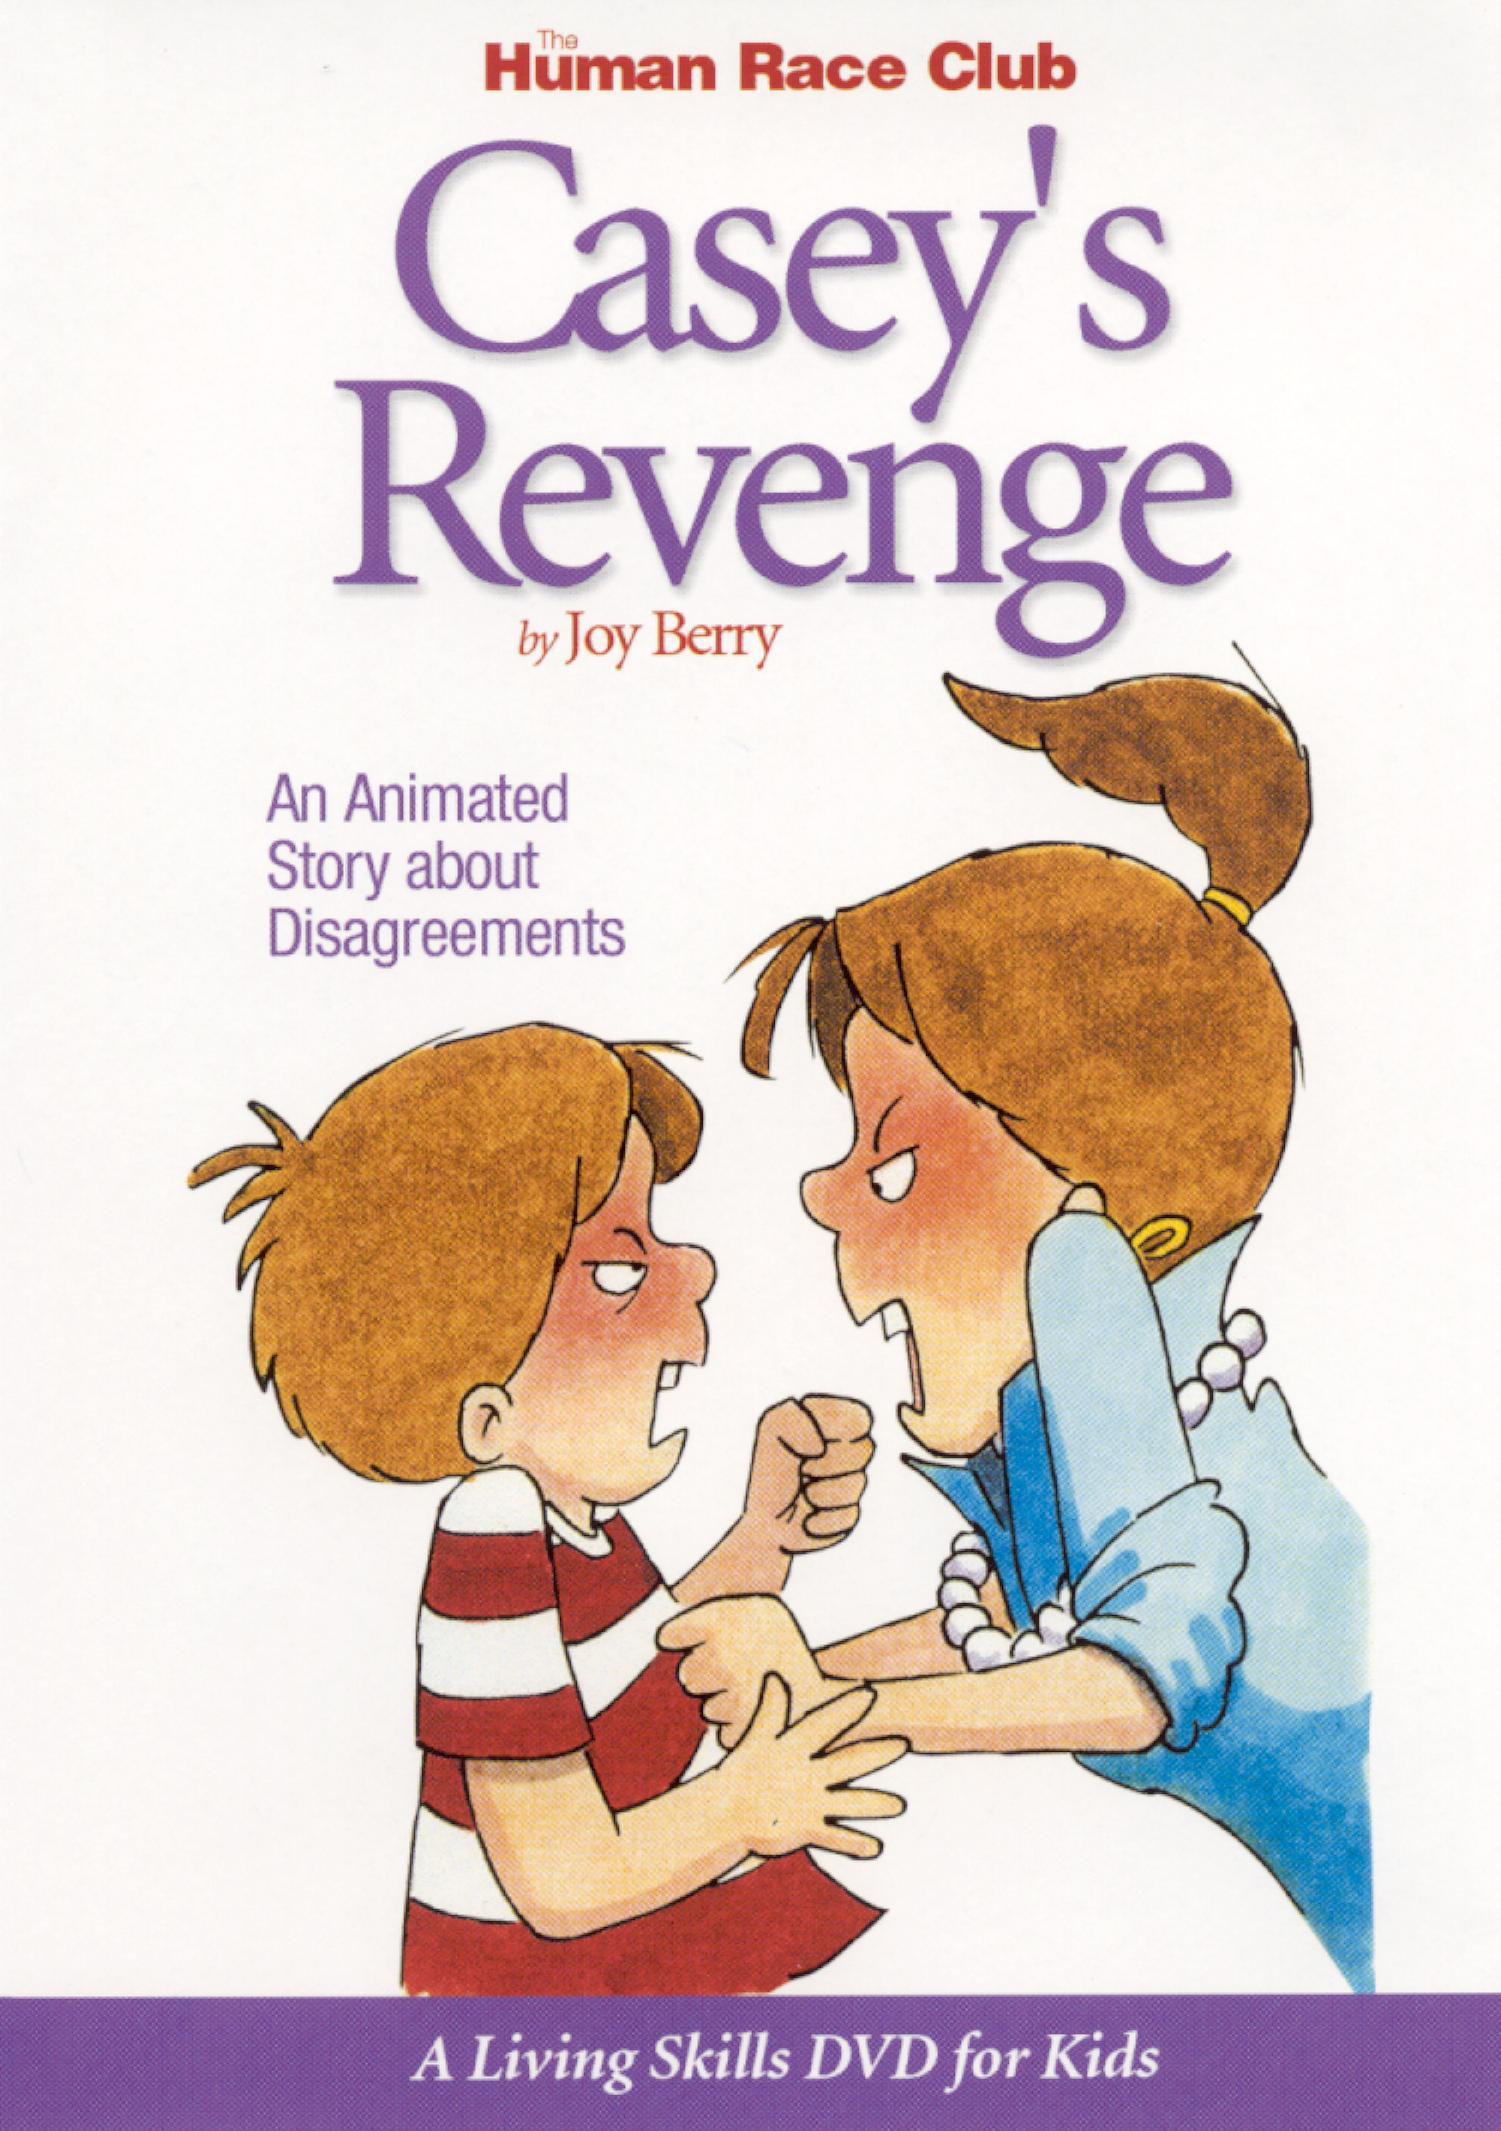 The Human Race Club: Casey's Revenge